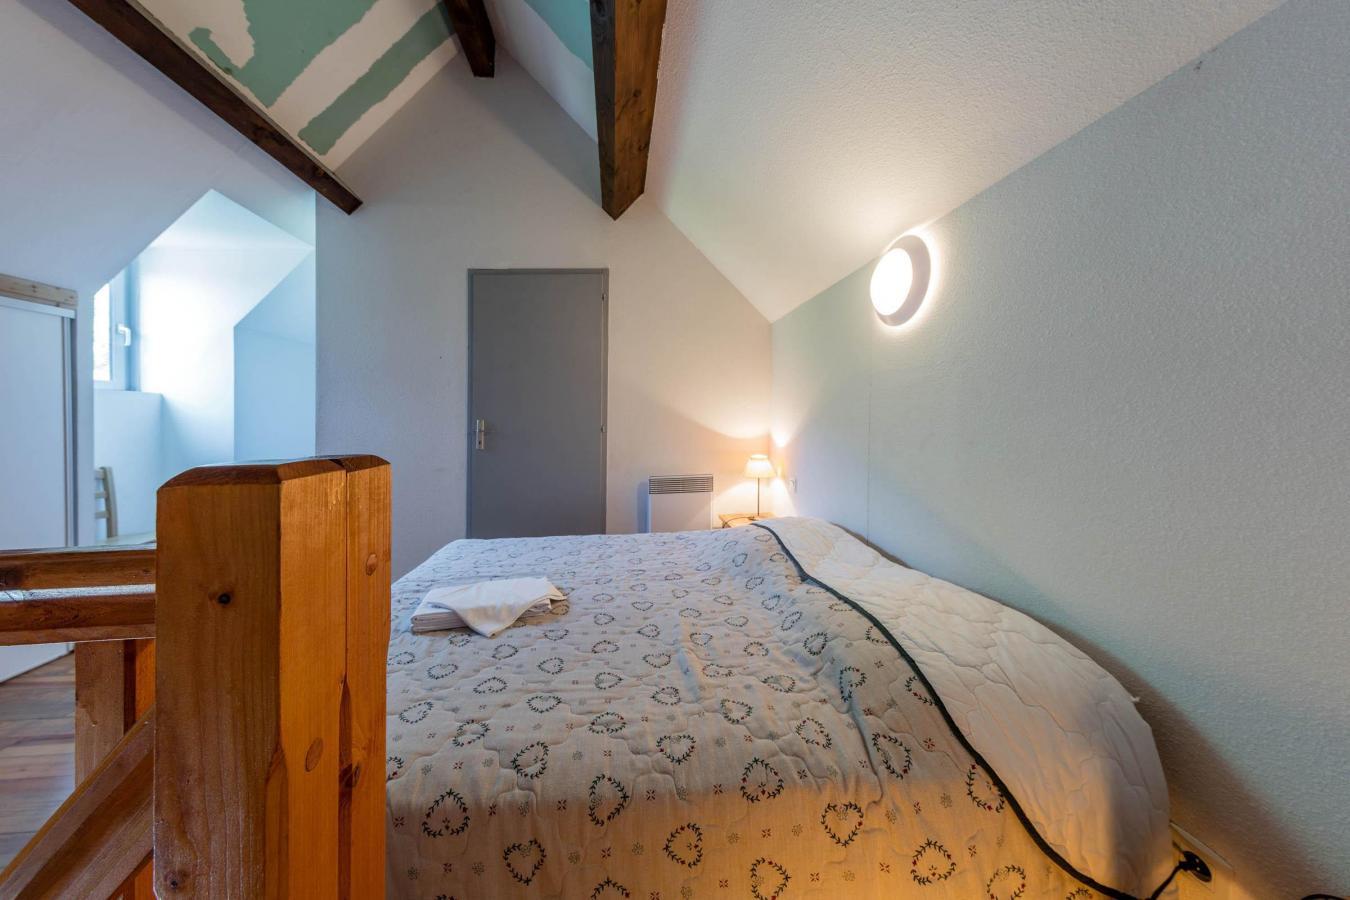 Location au ski Residence Les Trois Vallees - Saint Lary Soulan - Lit double